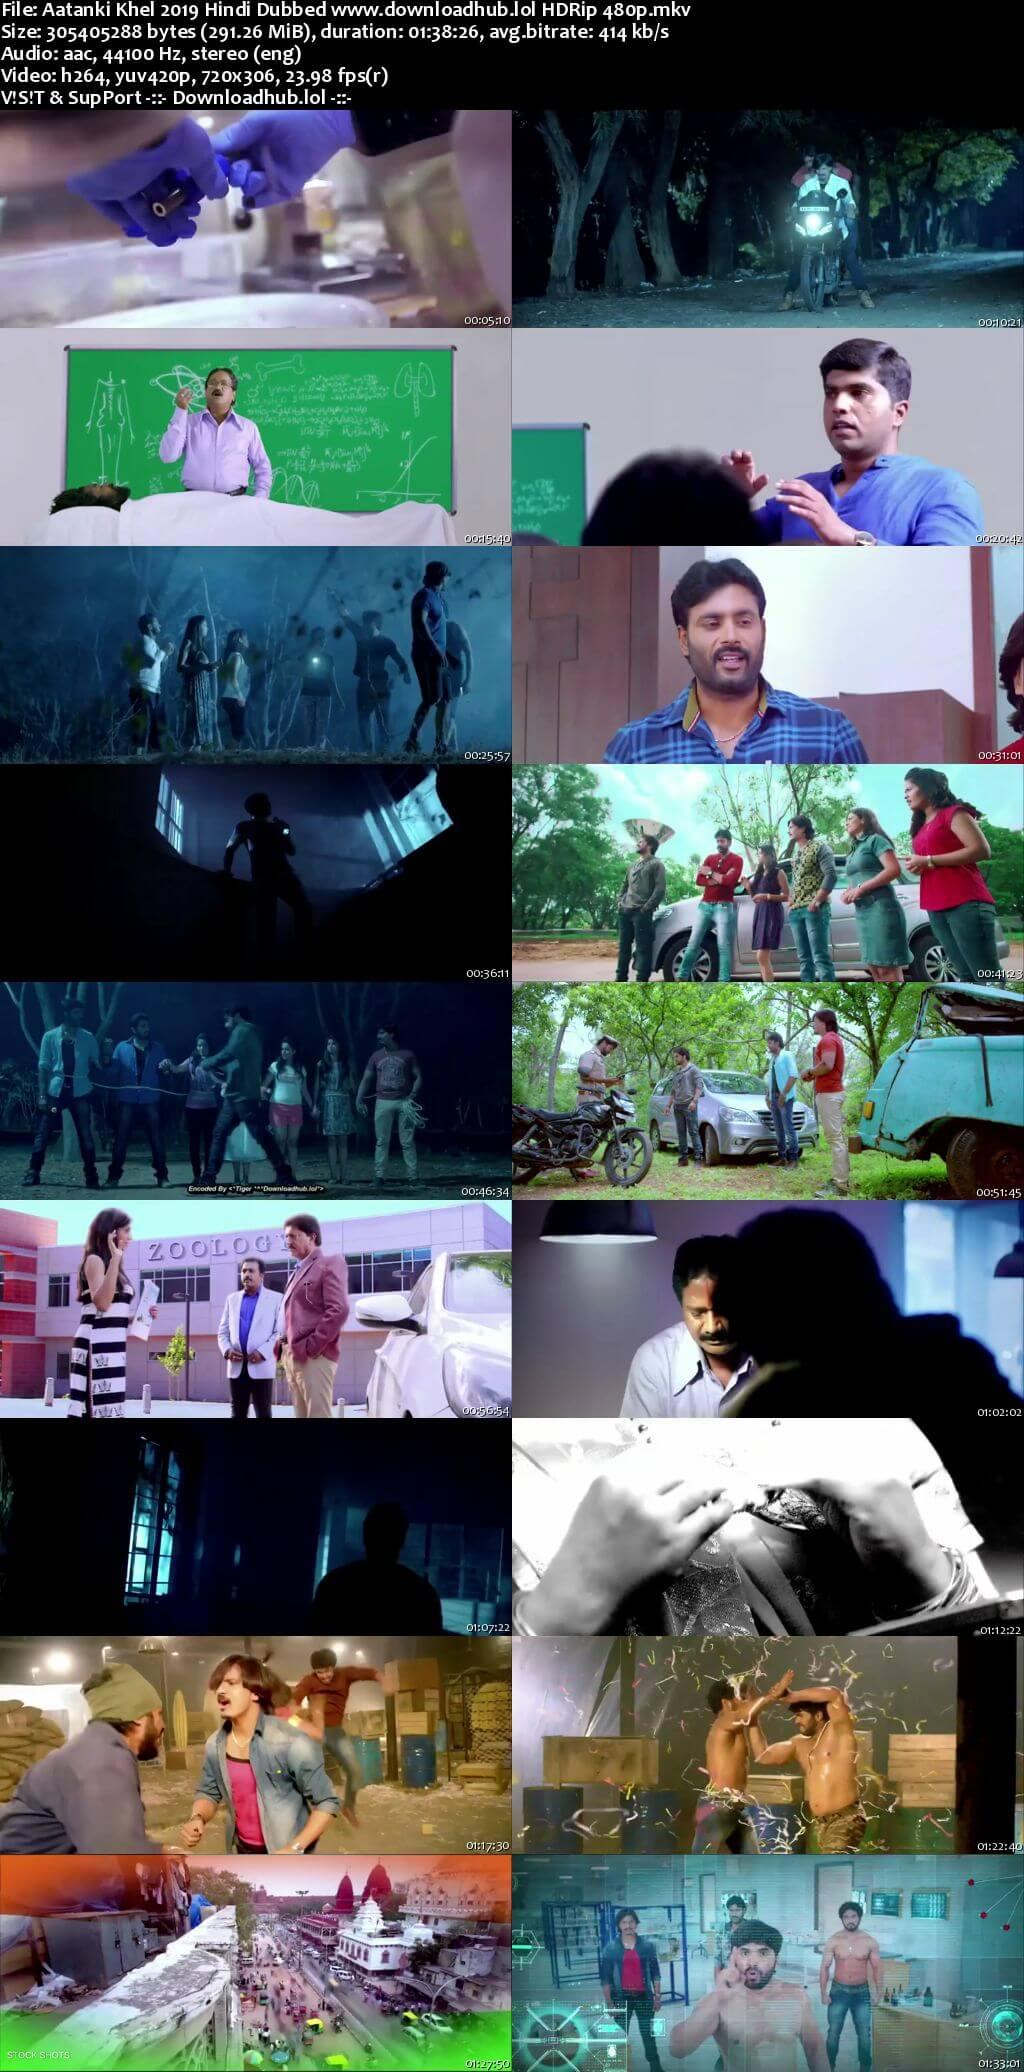 Aatanki Khel 2019 Hindi Dubbed 280MB HDRip 480p